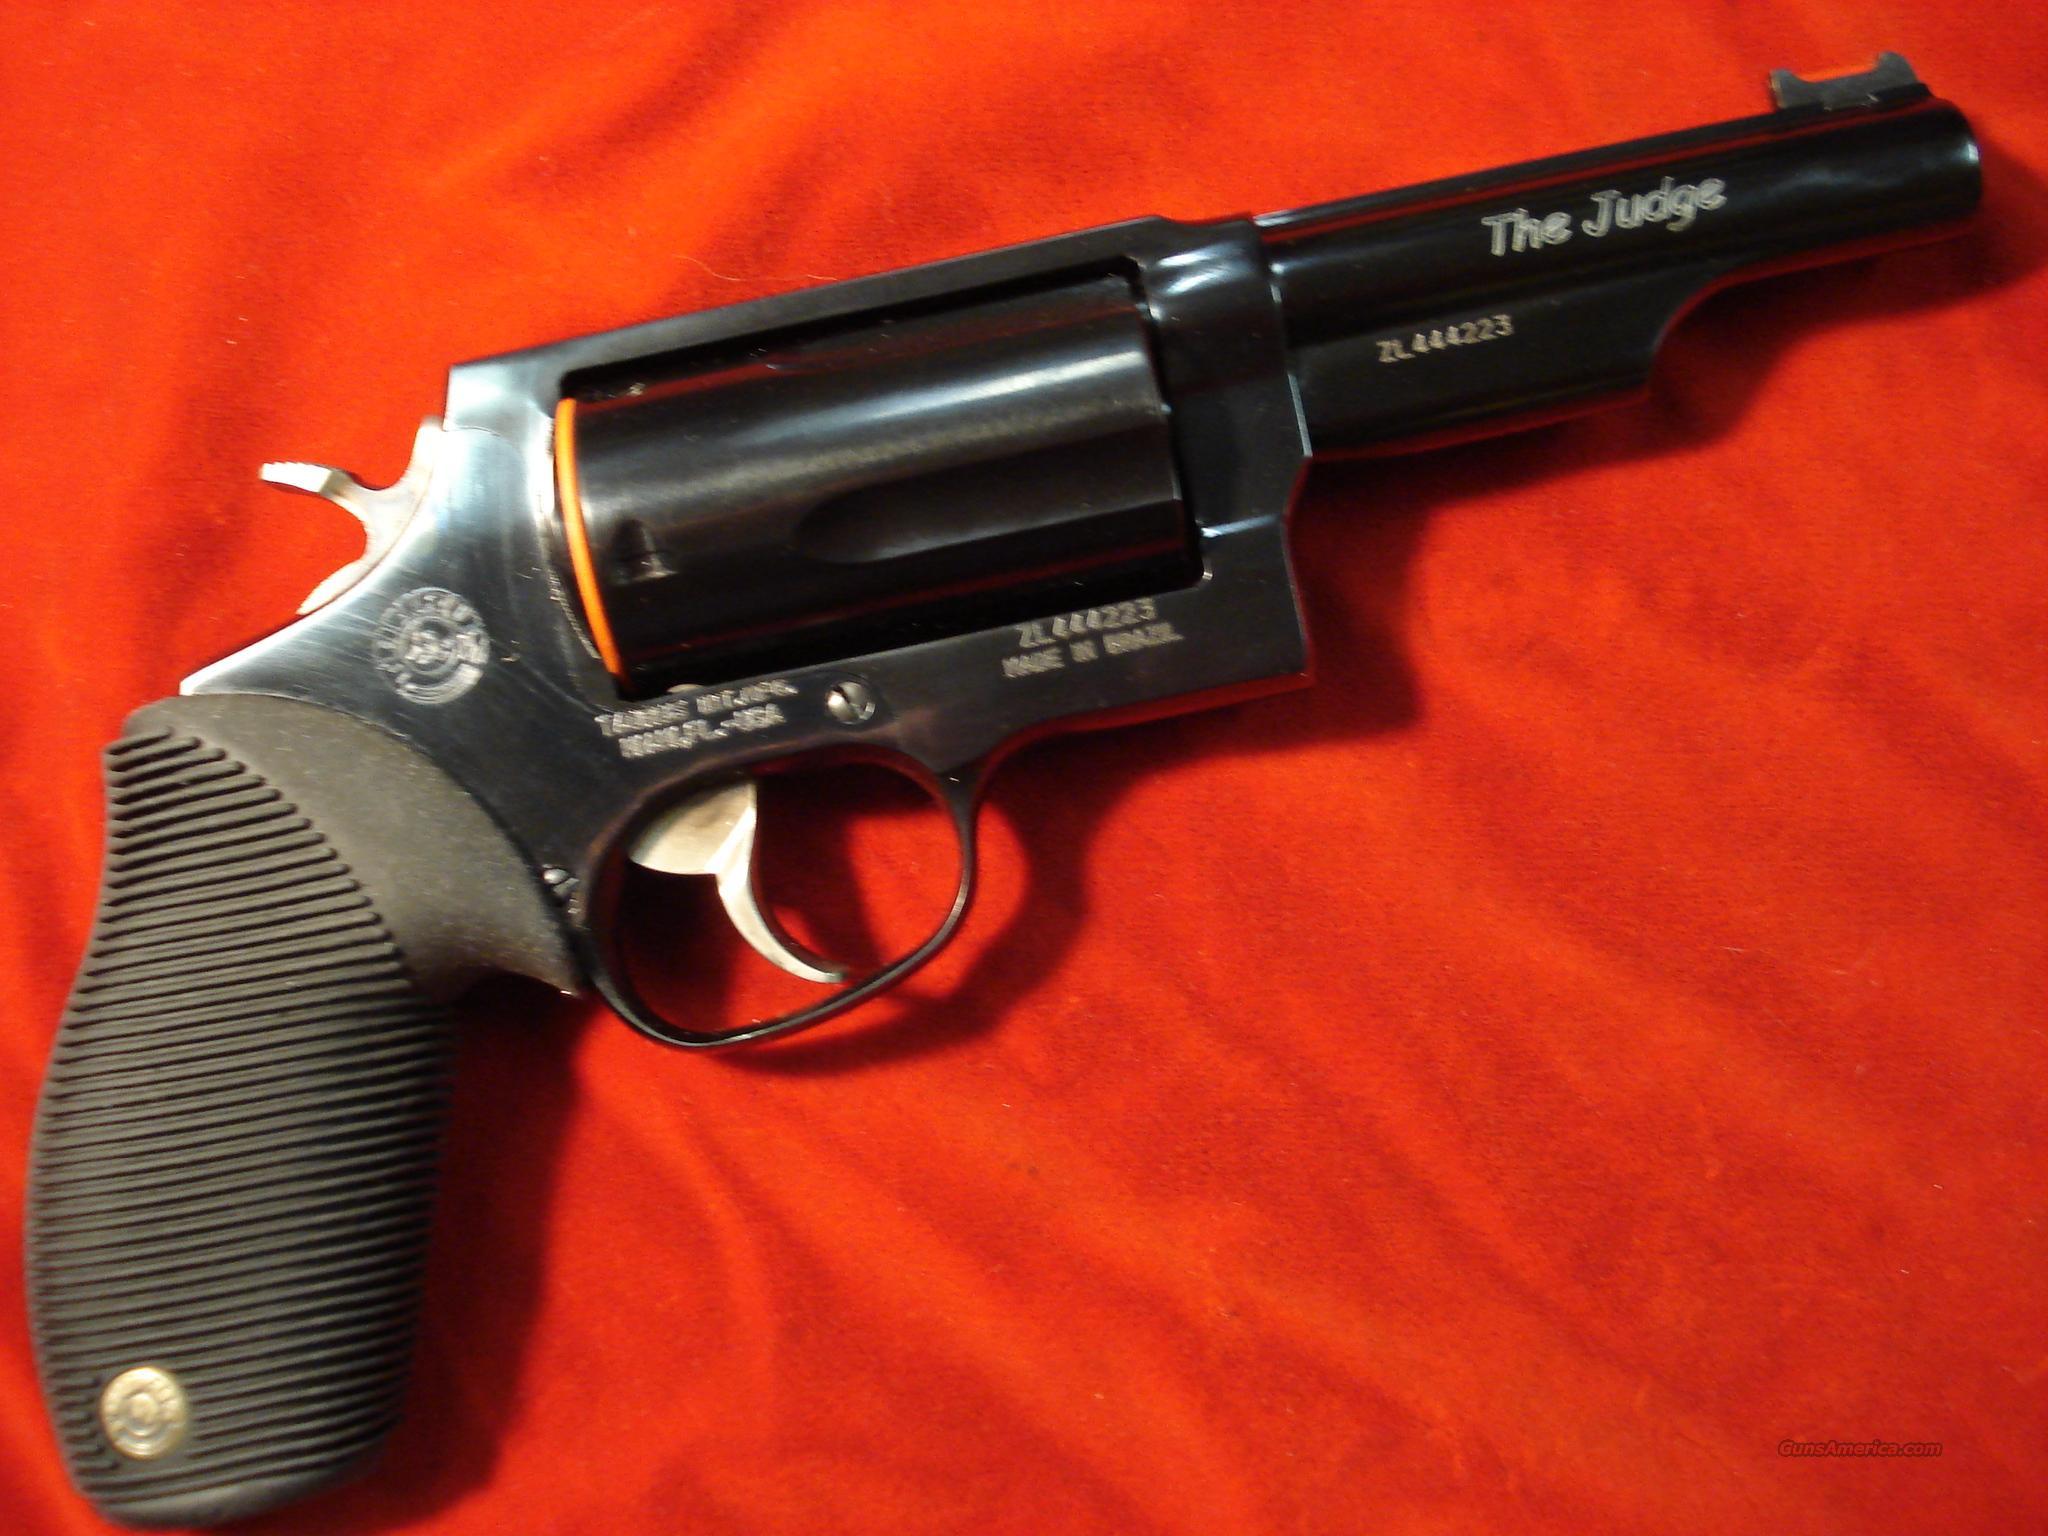 taurus 4510 tracker 410g revolver the judge for sale. Black Bedroom Furniture Sets. Home Design Ideas